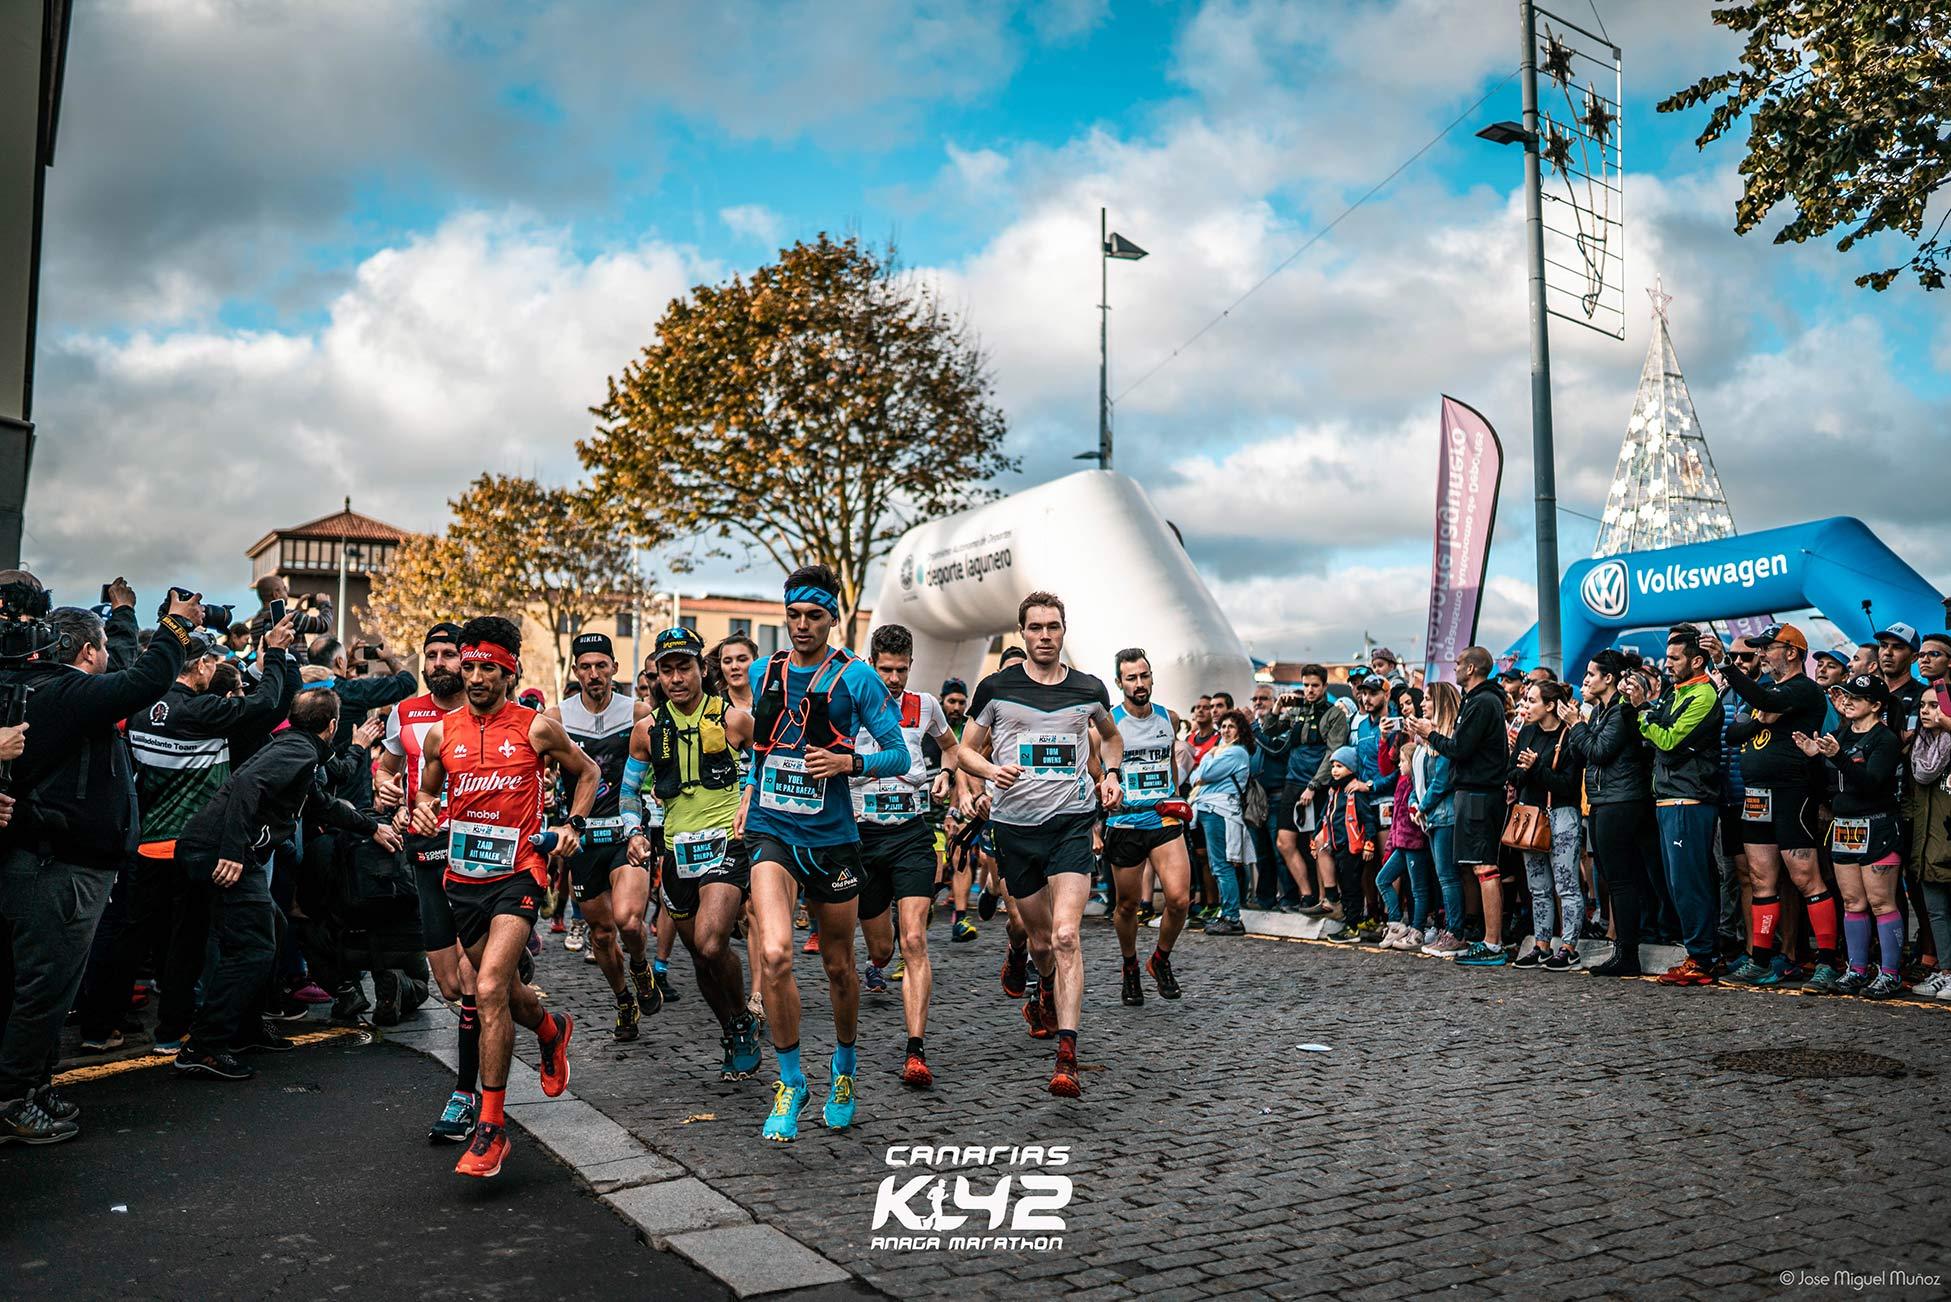 La K42 Anaga Marathon abre inscripciones